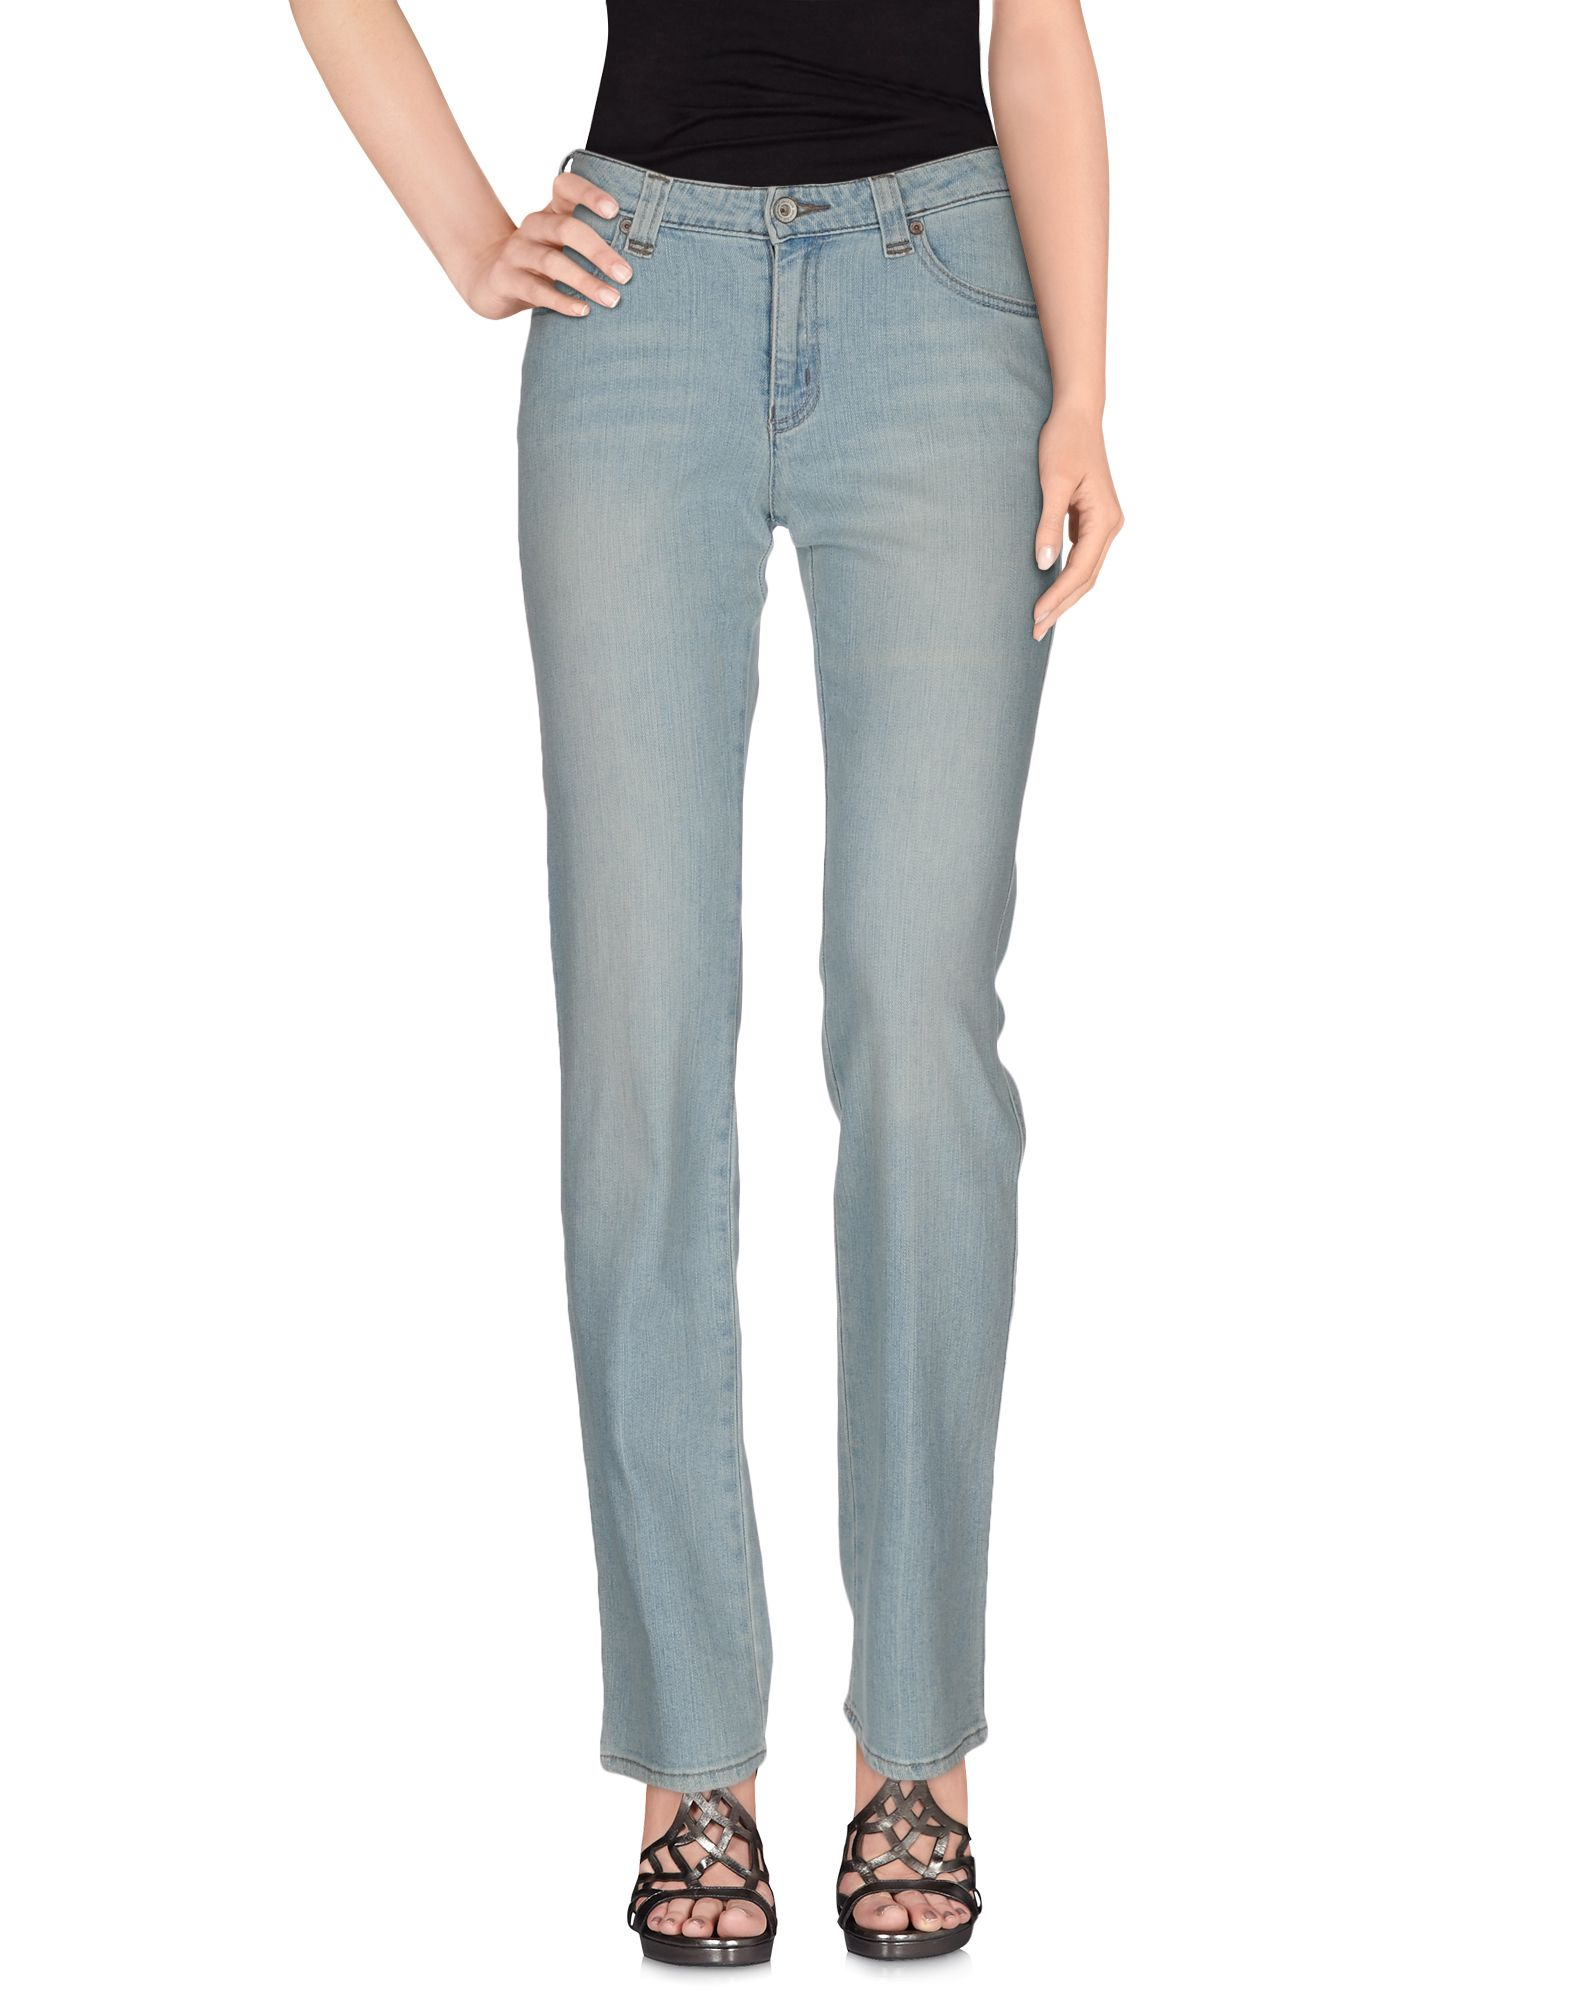 Pantaloni Jeans Armani Armani Armani Jeans donna - 42542054JK a04